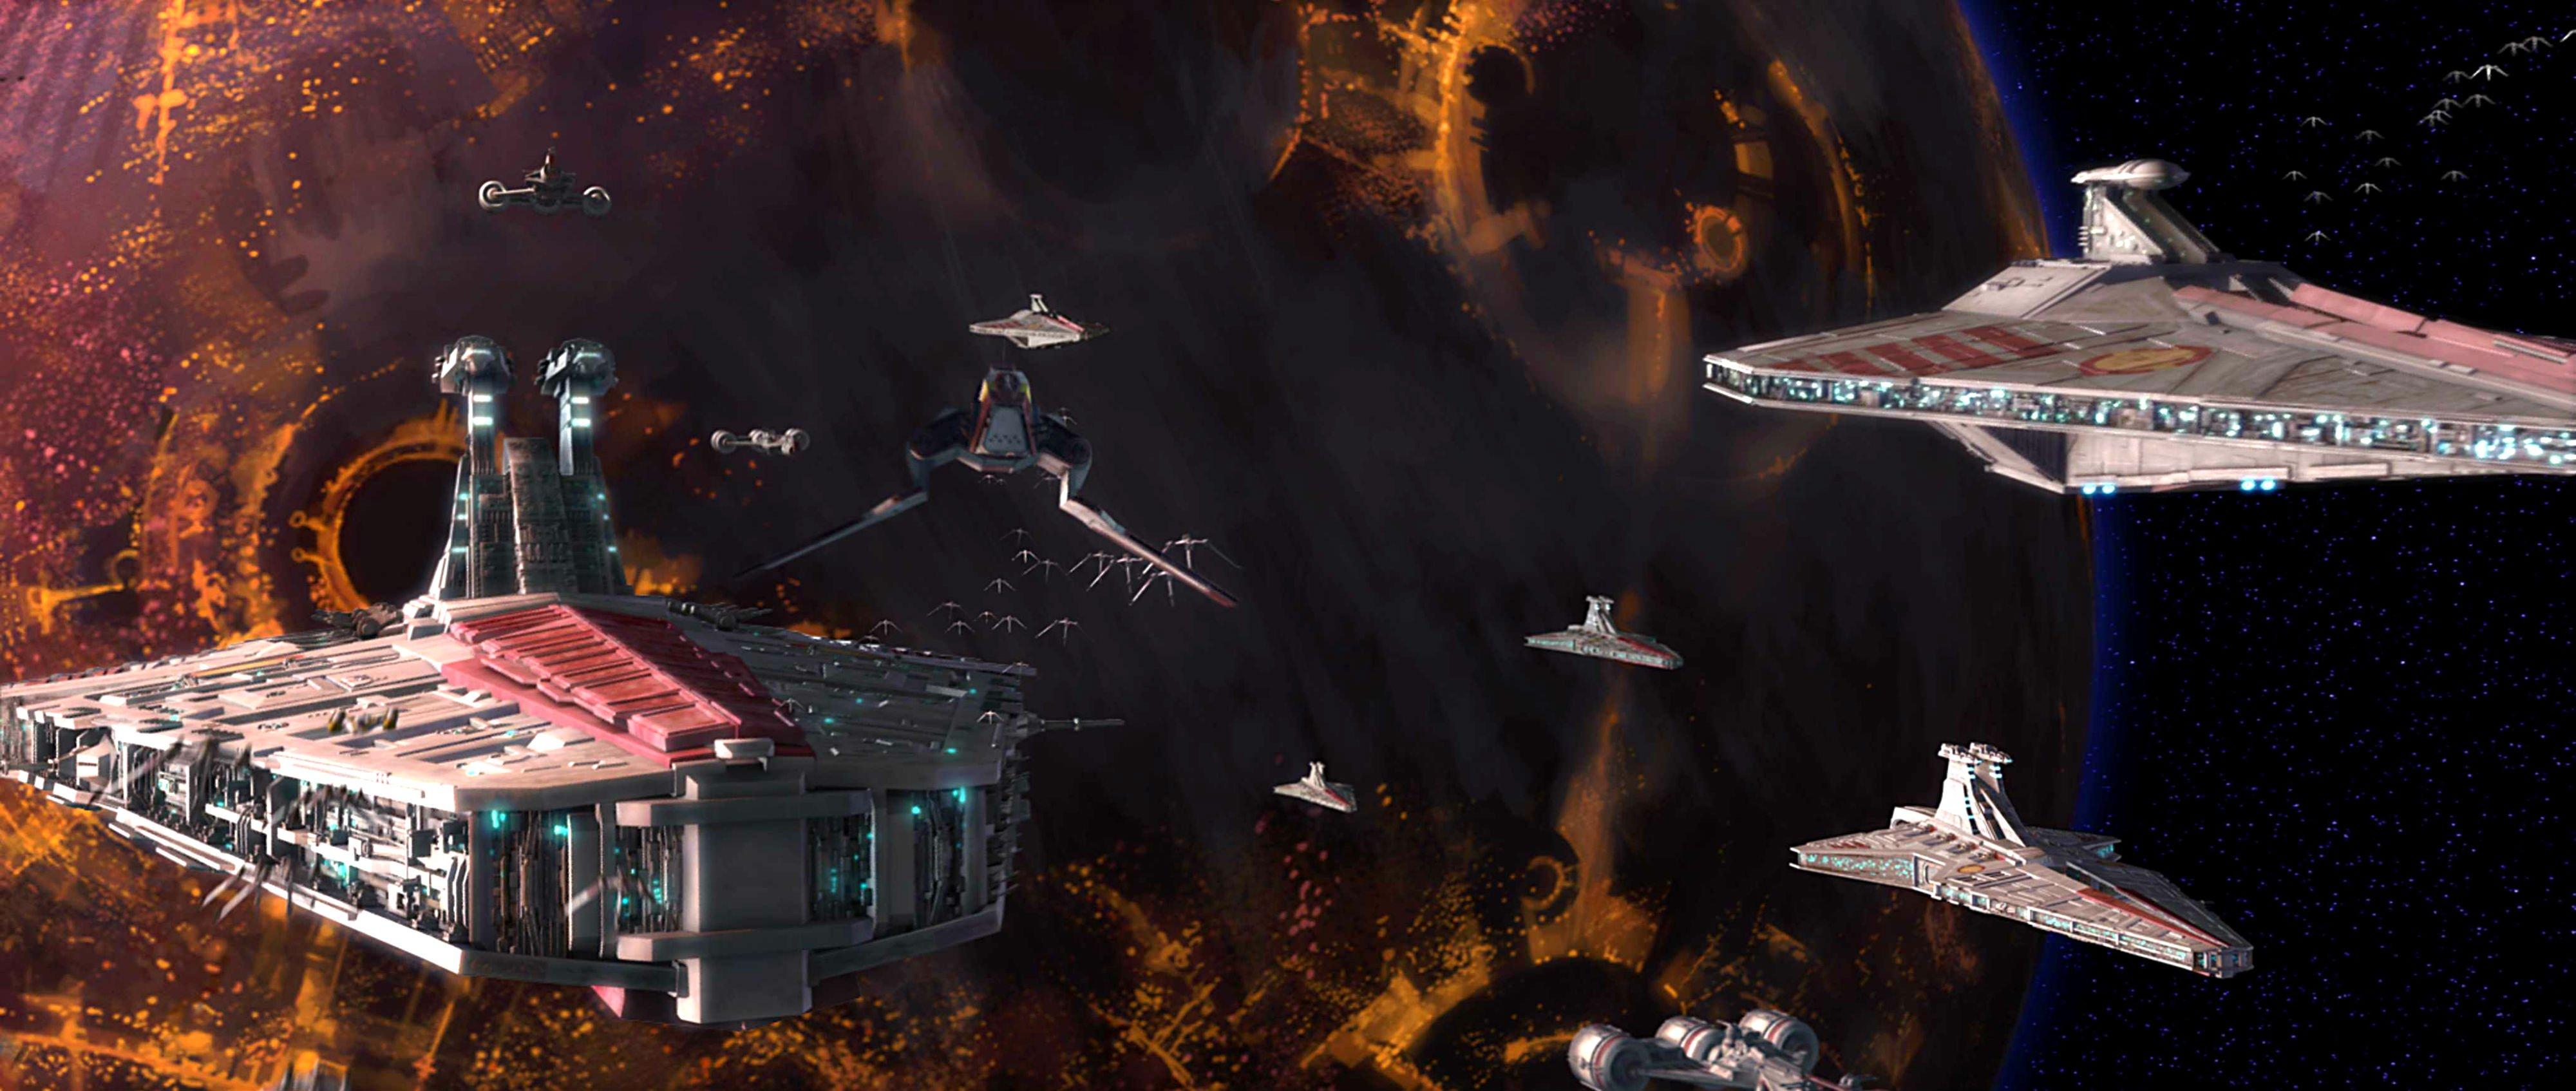 Free Download Star Wars Clone Wars Animation Sci Fi Cartoon